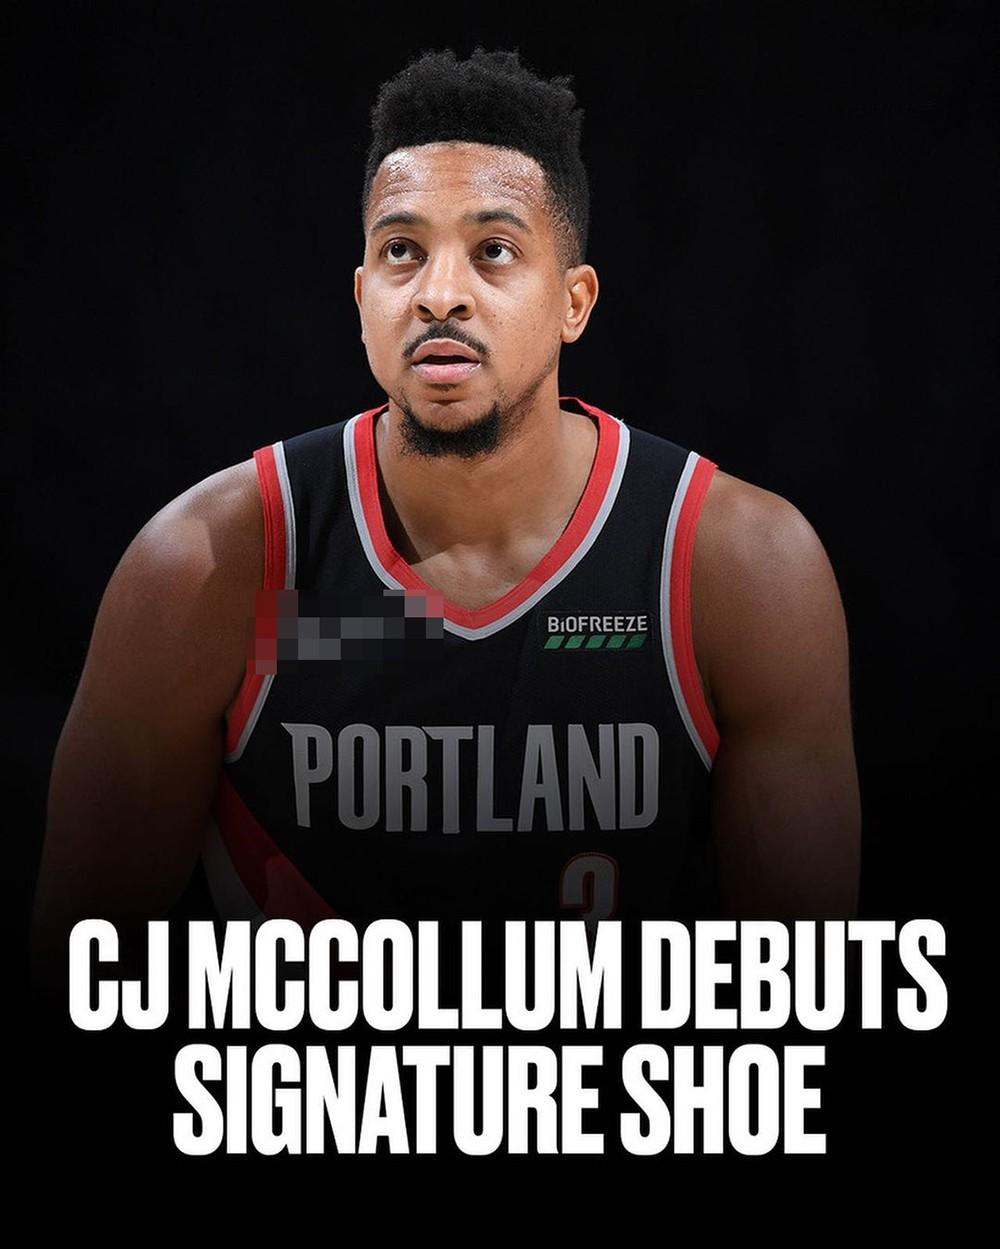 CJ,李宁  CJ 抢先上脚,签名鞋有新消息!这颜值看完真爱了!